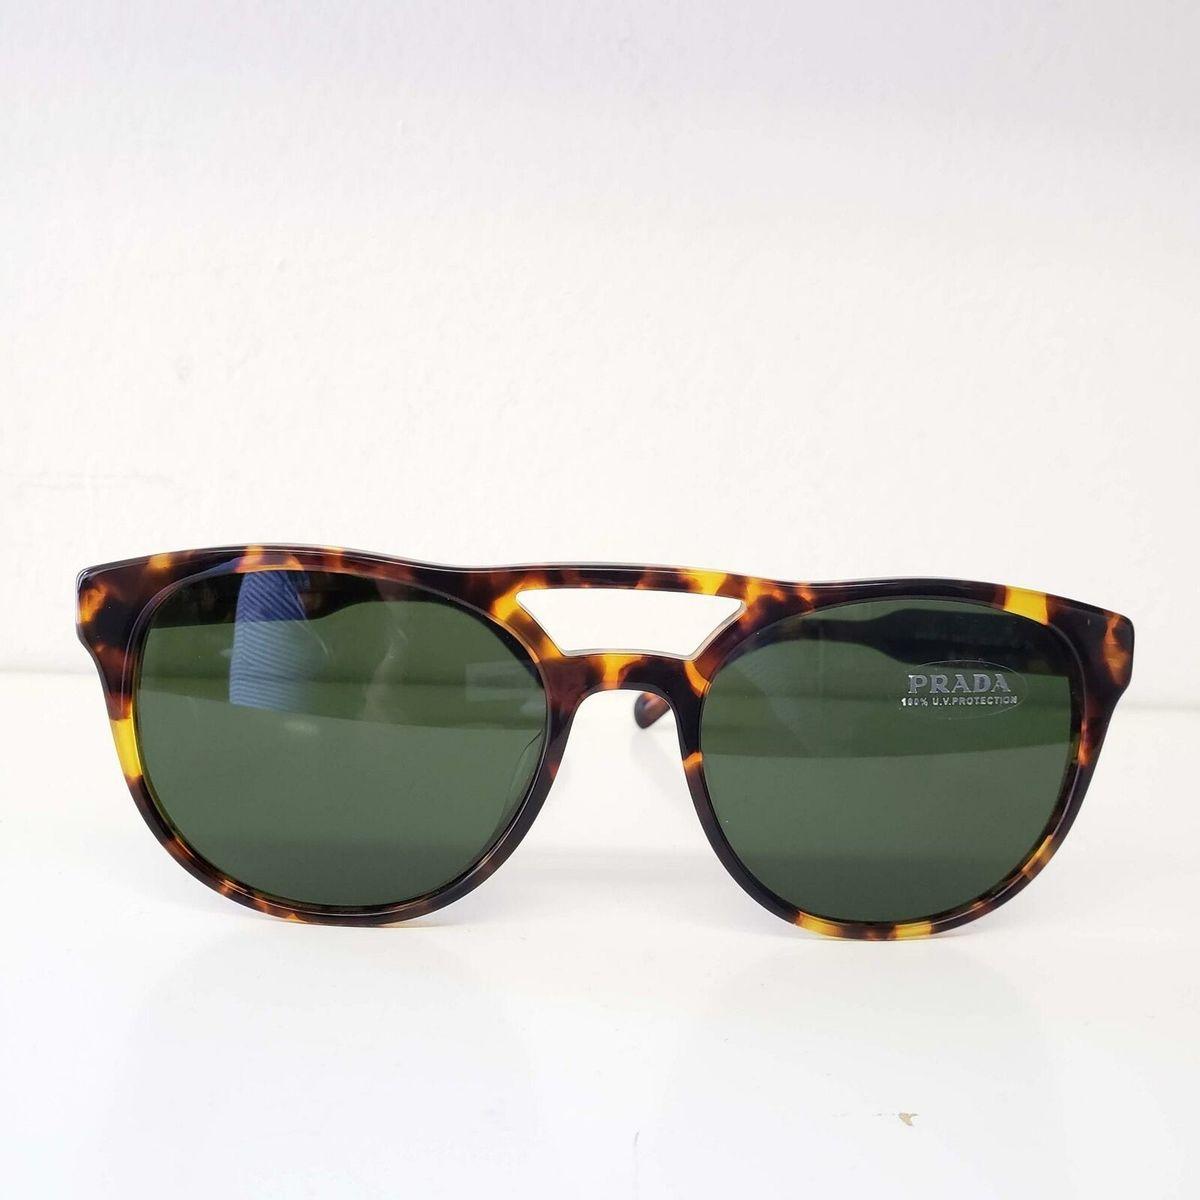 Prada プラダ メンズ トートイズフレーム サングラス ブラウンPR 13TSF VAU1|0 -54 Men's Havana Frame Sunglasses Brown